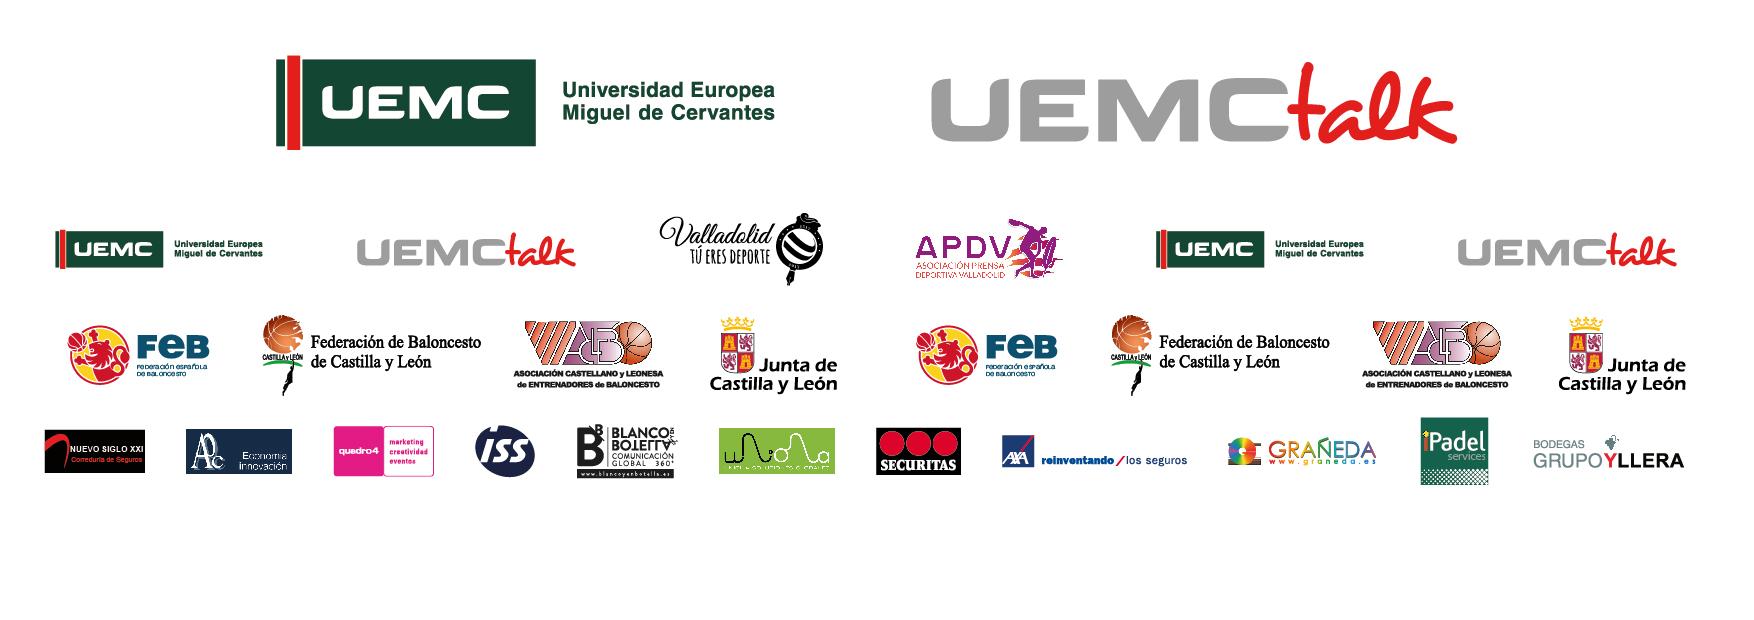 UEMCtalk 2017 1